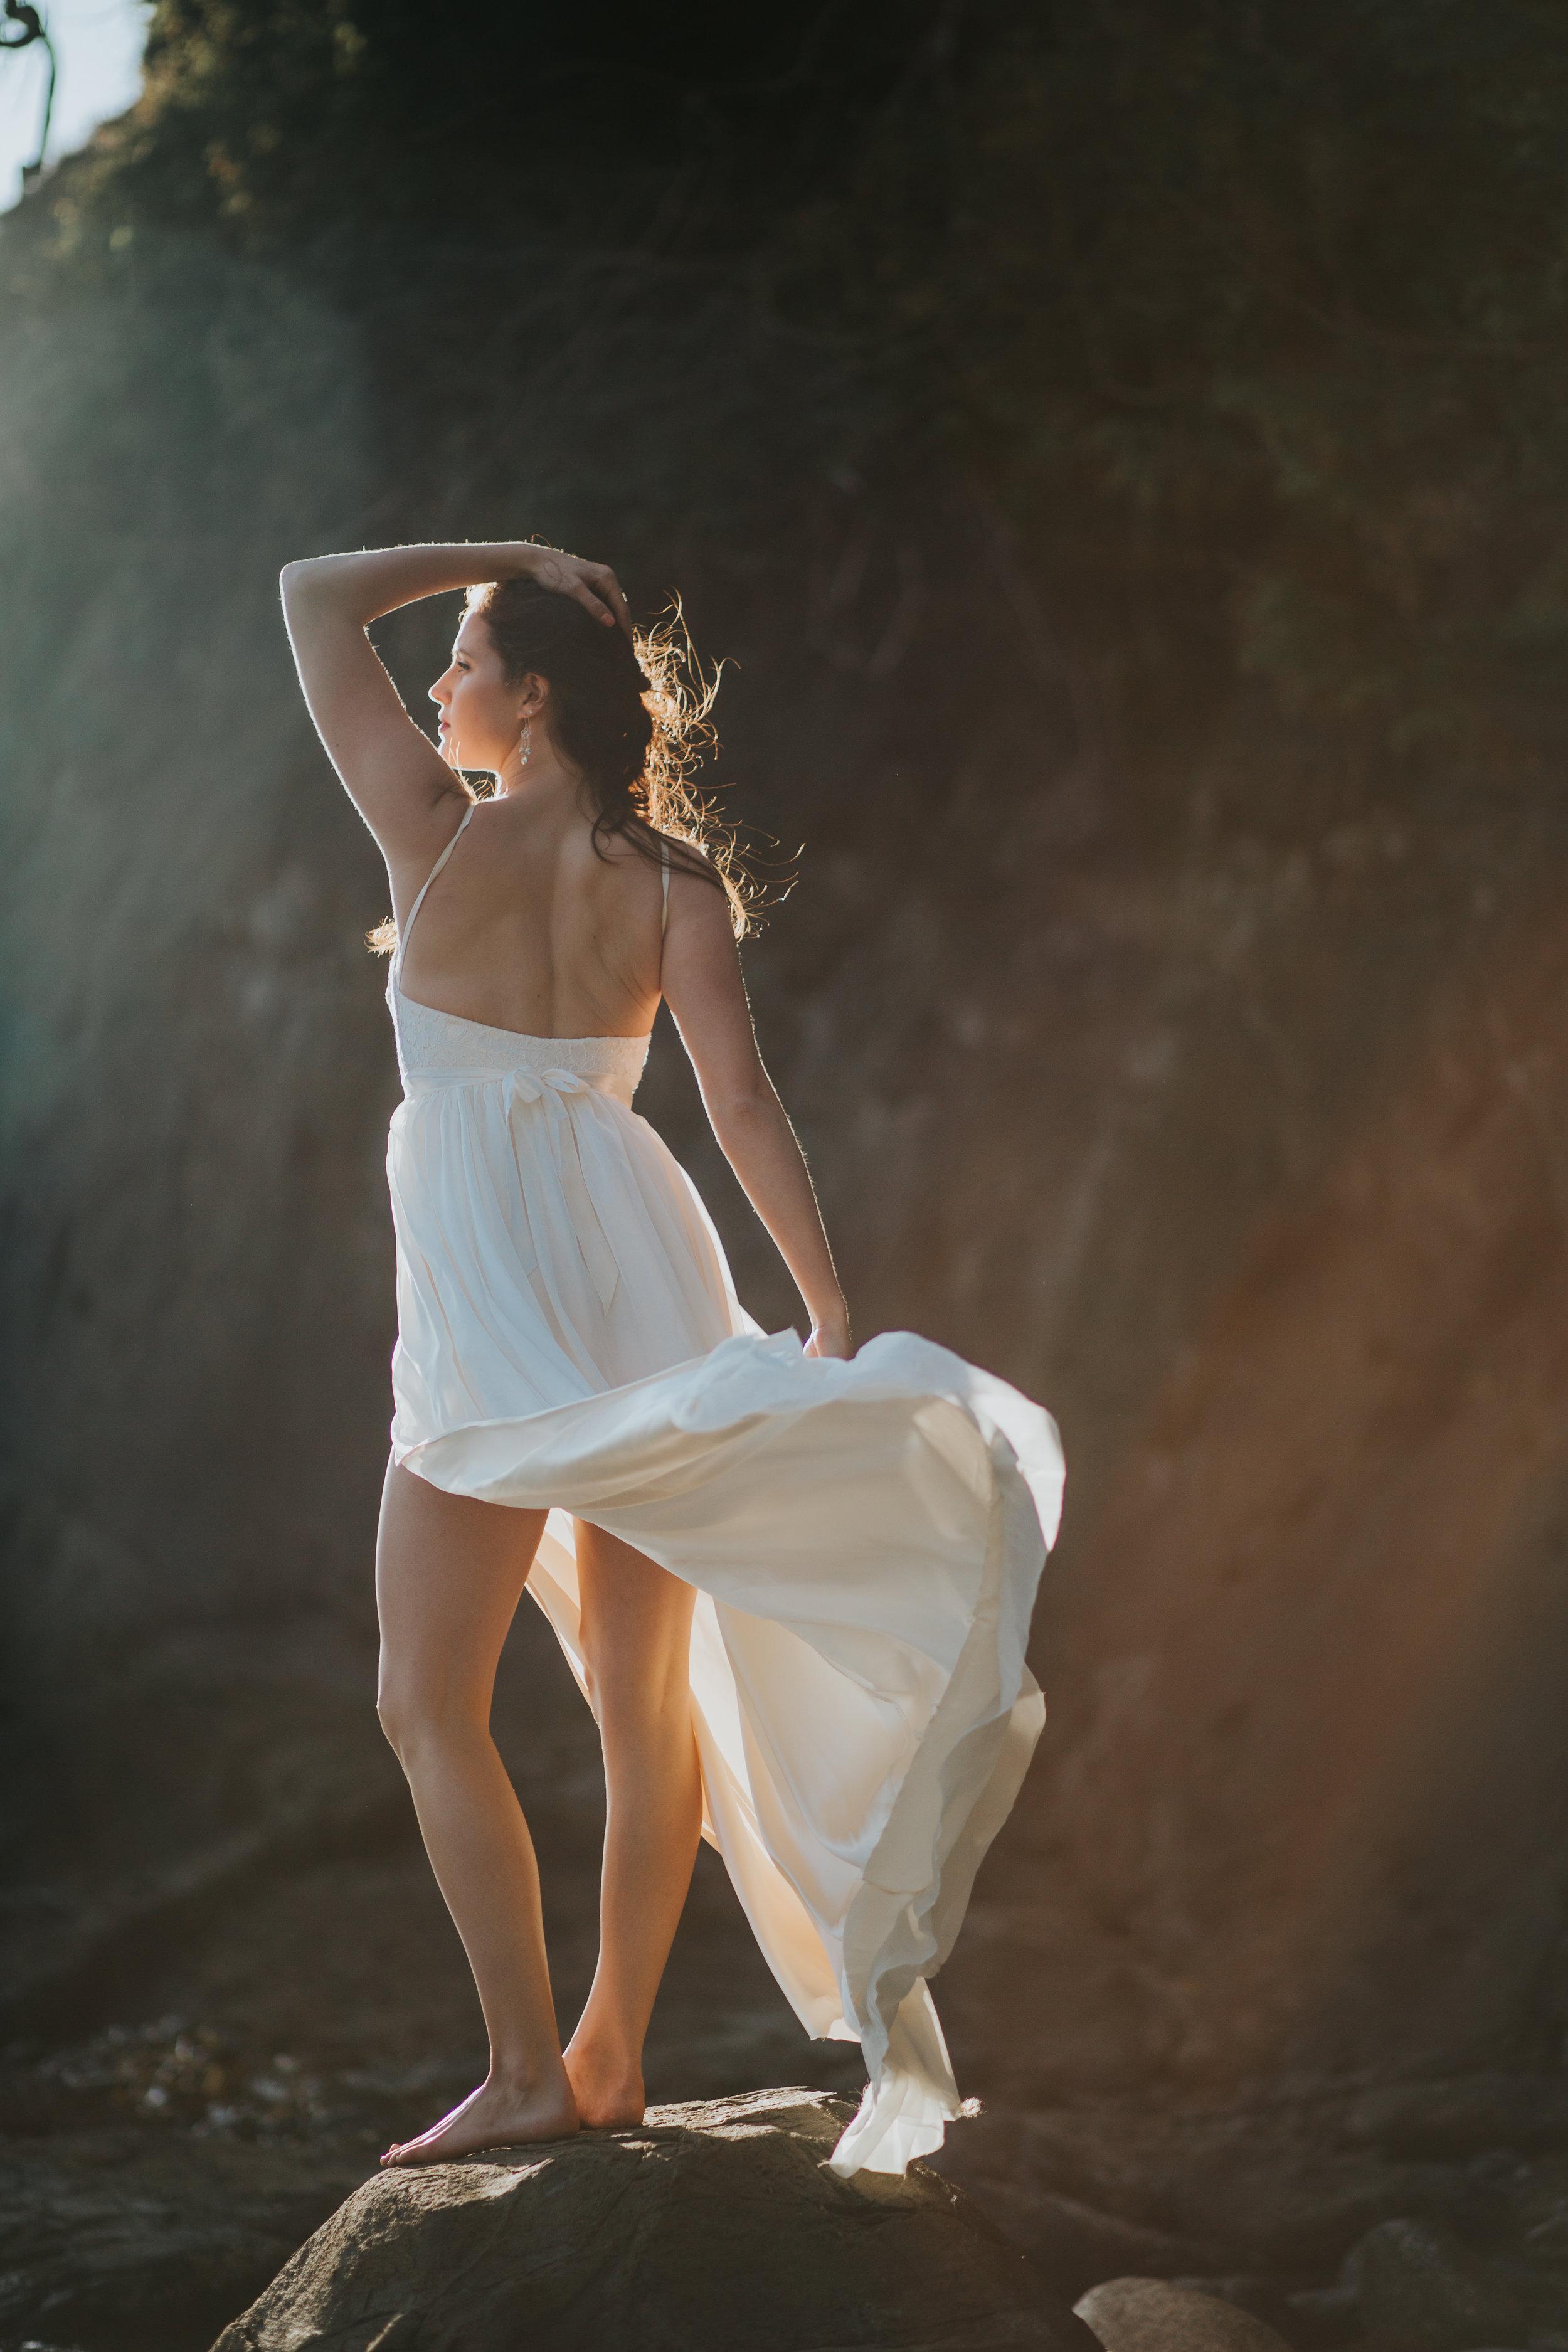 Port-Angeles-Salt-Creek-beach-wedding-bride-PNW-olympic-peninsula-photographer-Kayla-Dawn-Photography-outdoors-golden-hour-dancer-dress (34).jpg